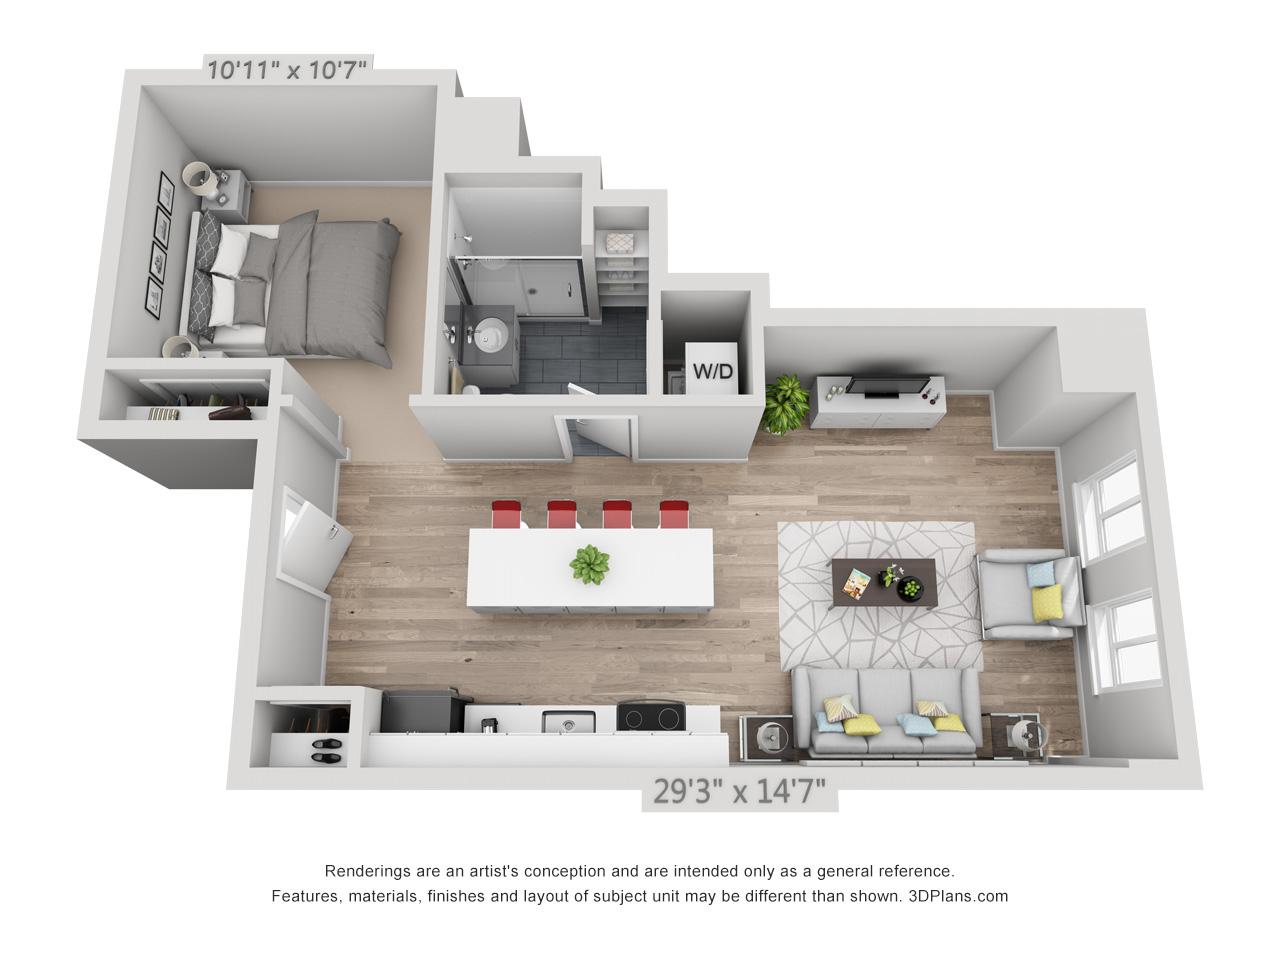 studio apartments in rittenhouse square